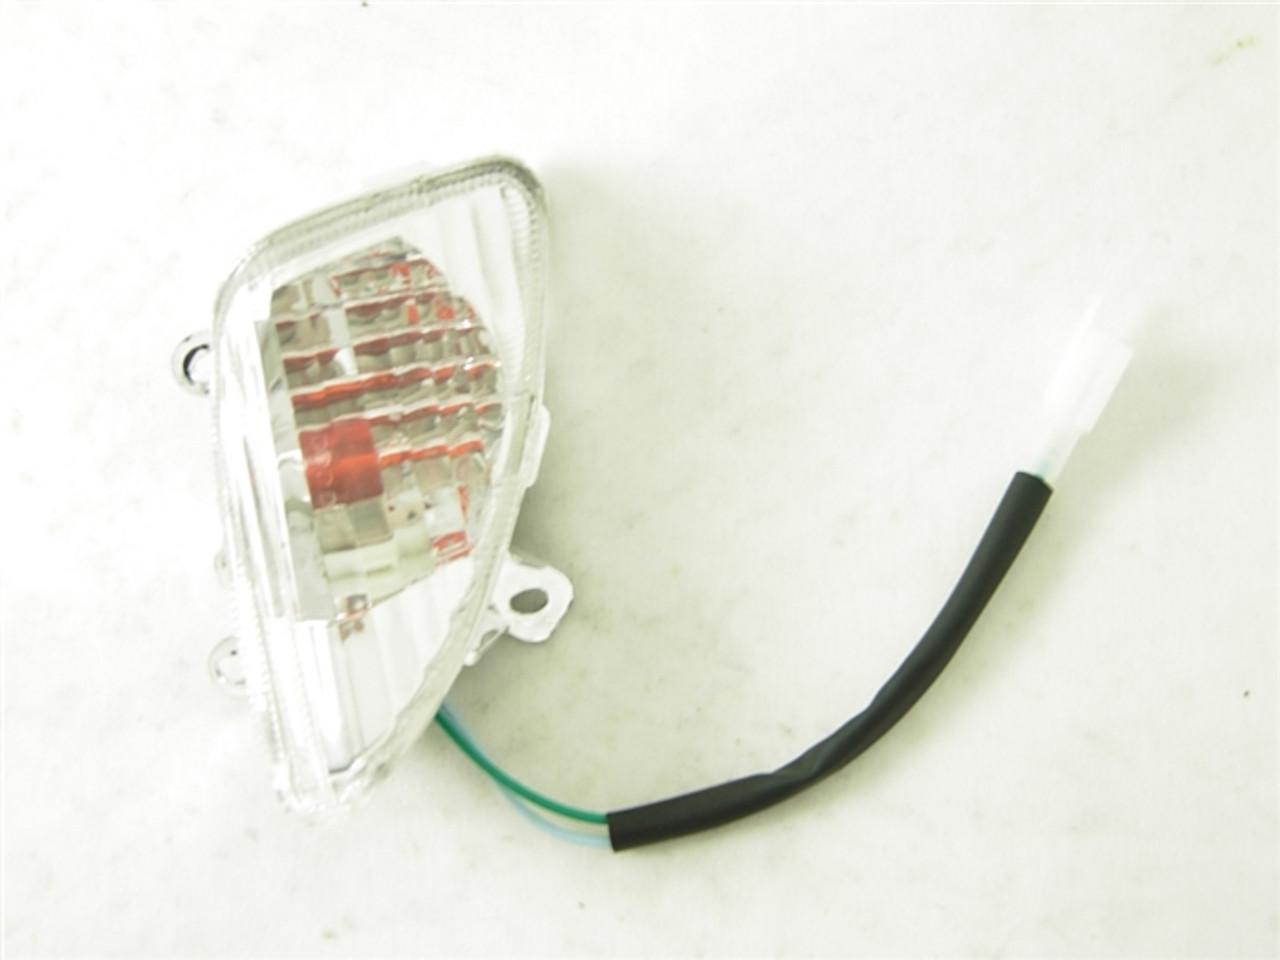 SIGNAL LIGHT ASSEMBLY (LEFT SIDE) 11621-A91-1